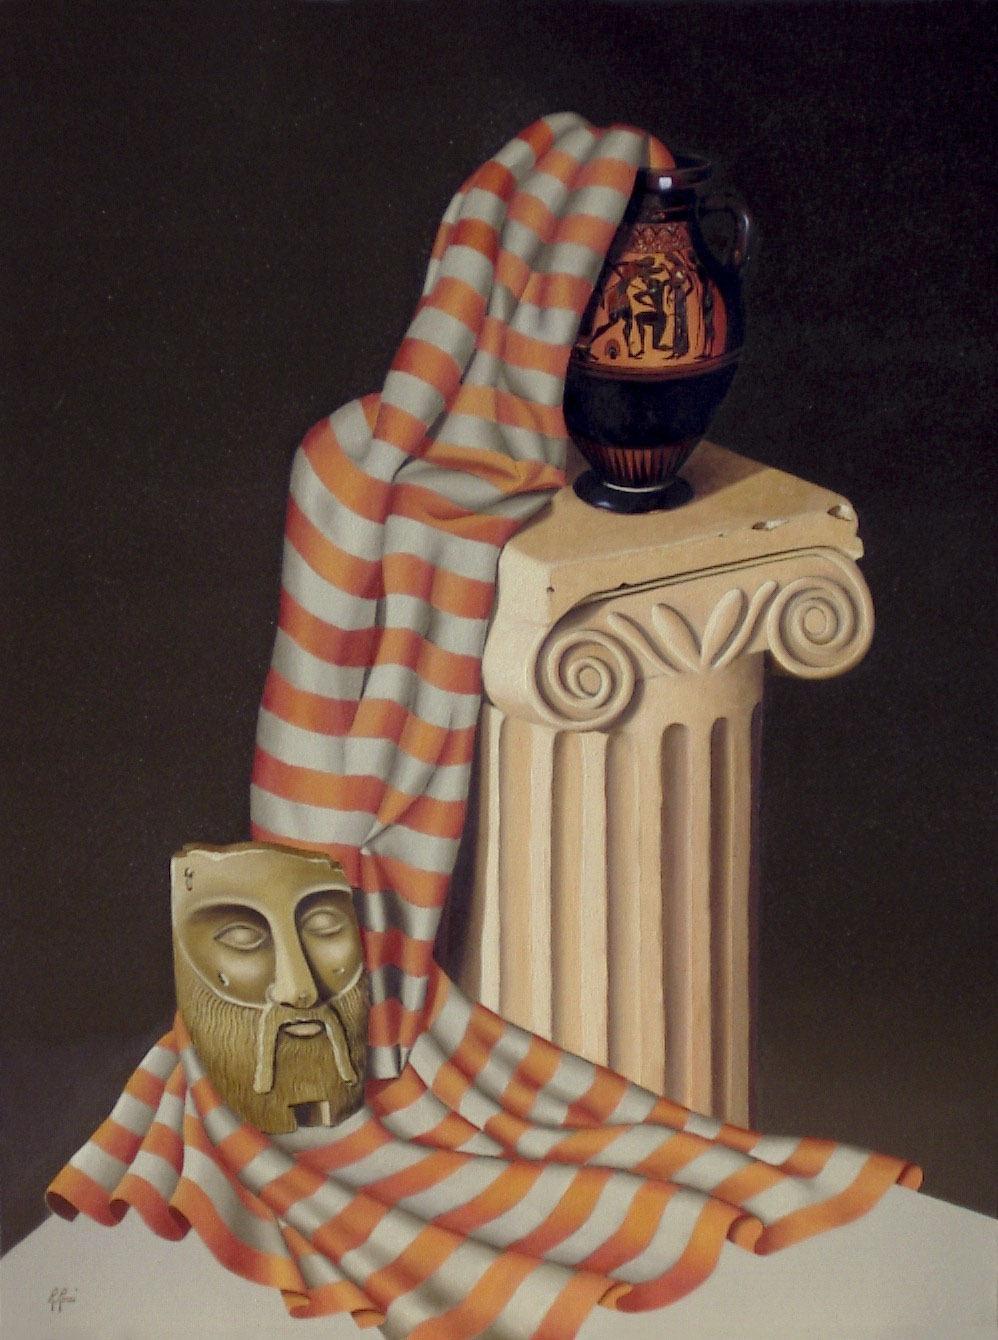 2005 roberta rossi - Teseo uccide il minotauro - olio su tela - 80 x 60